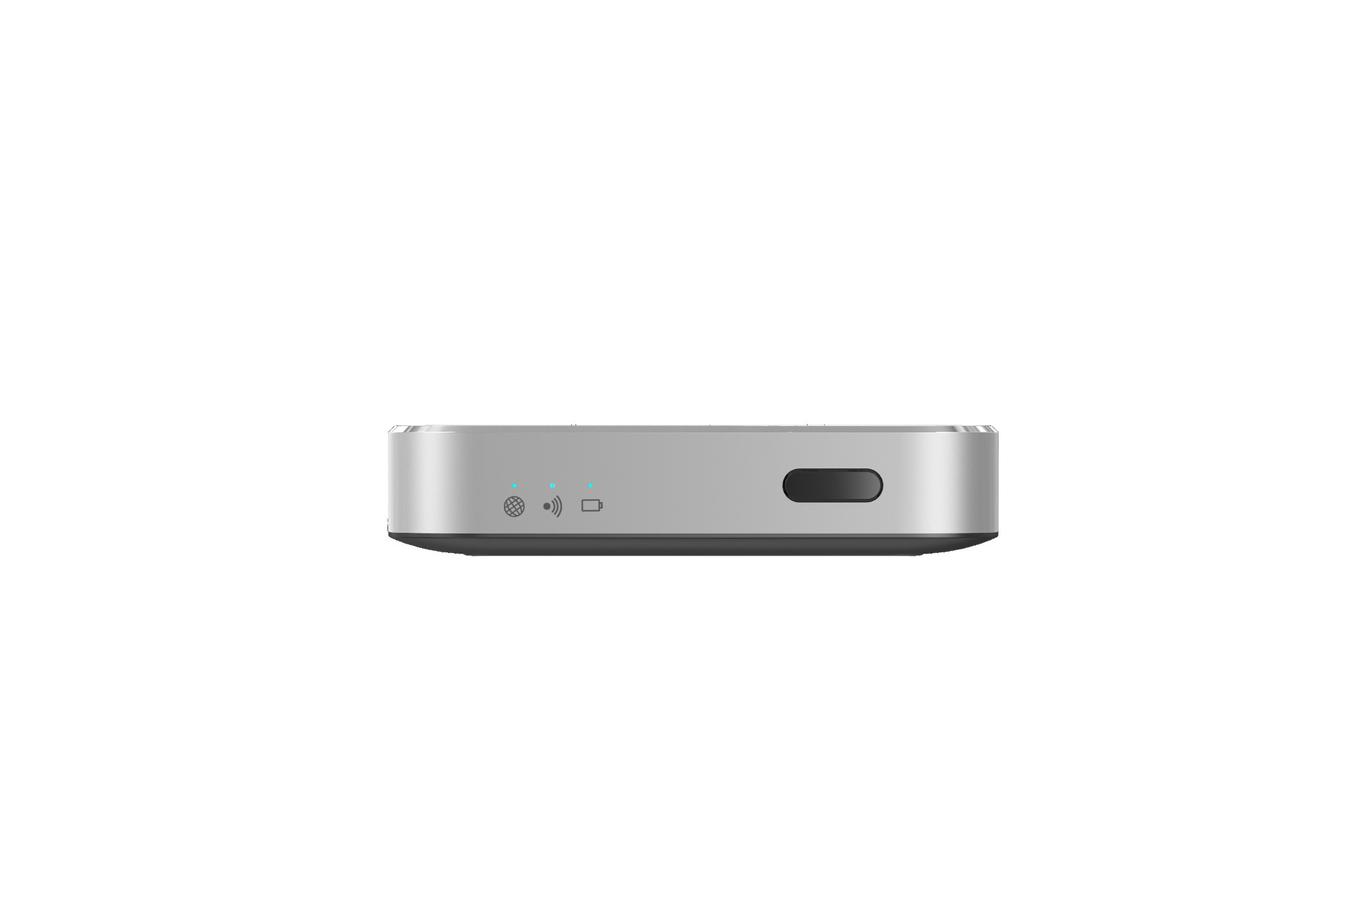 disque dur externe sandisk connect wireless media drive 32. Black Bedroom Furniture Sets. Home Design Ideas